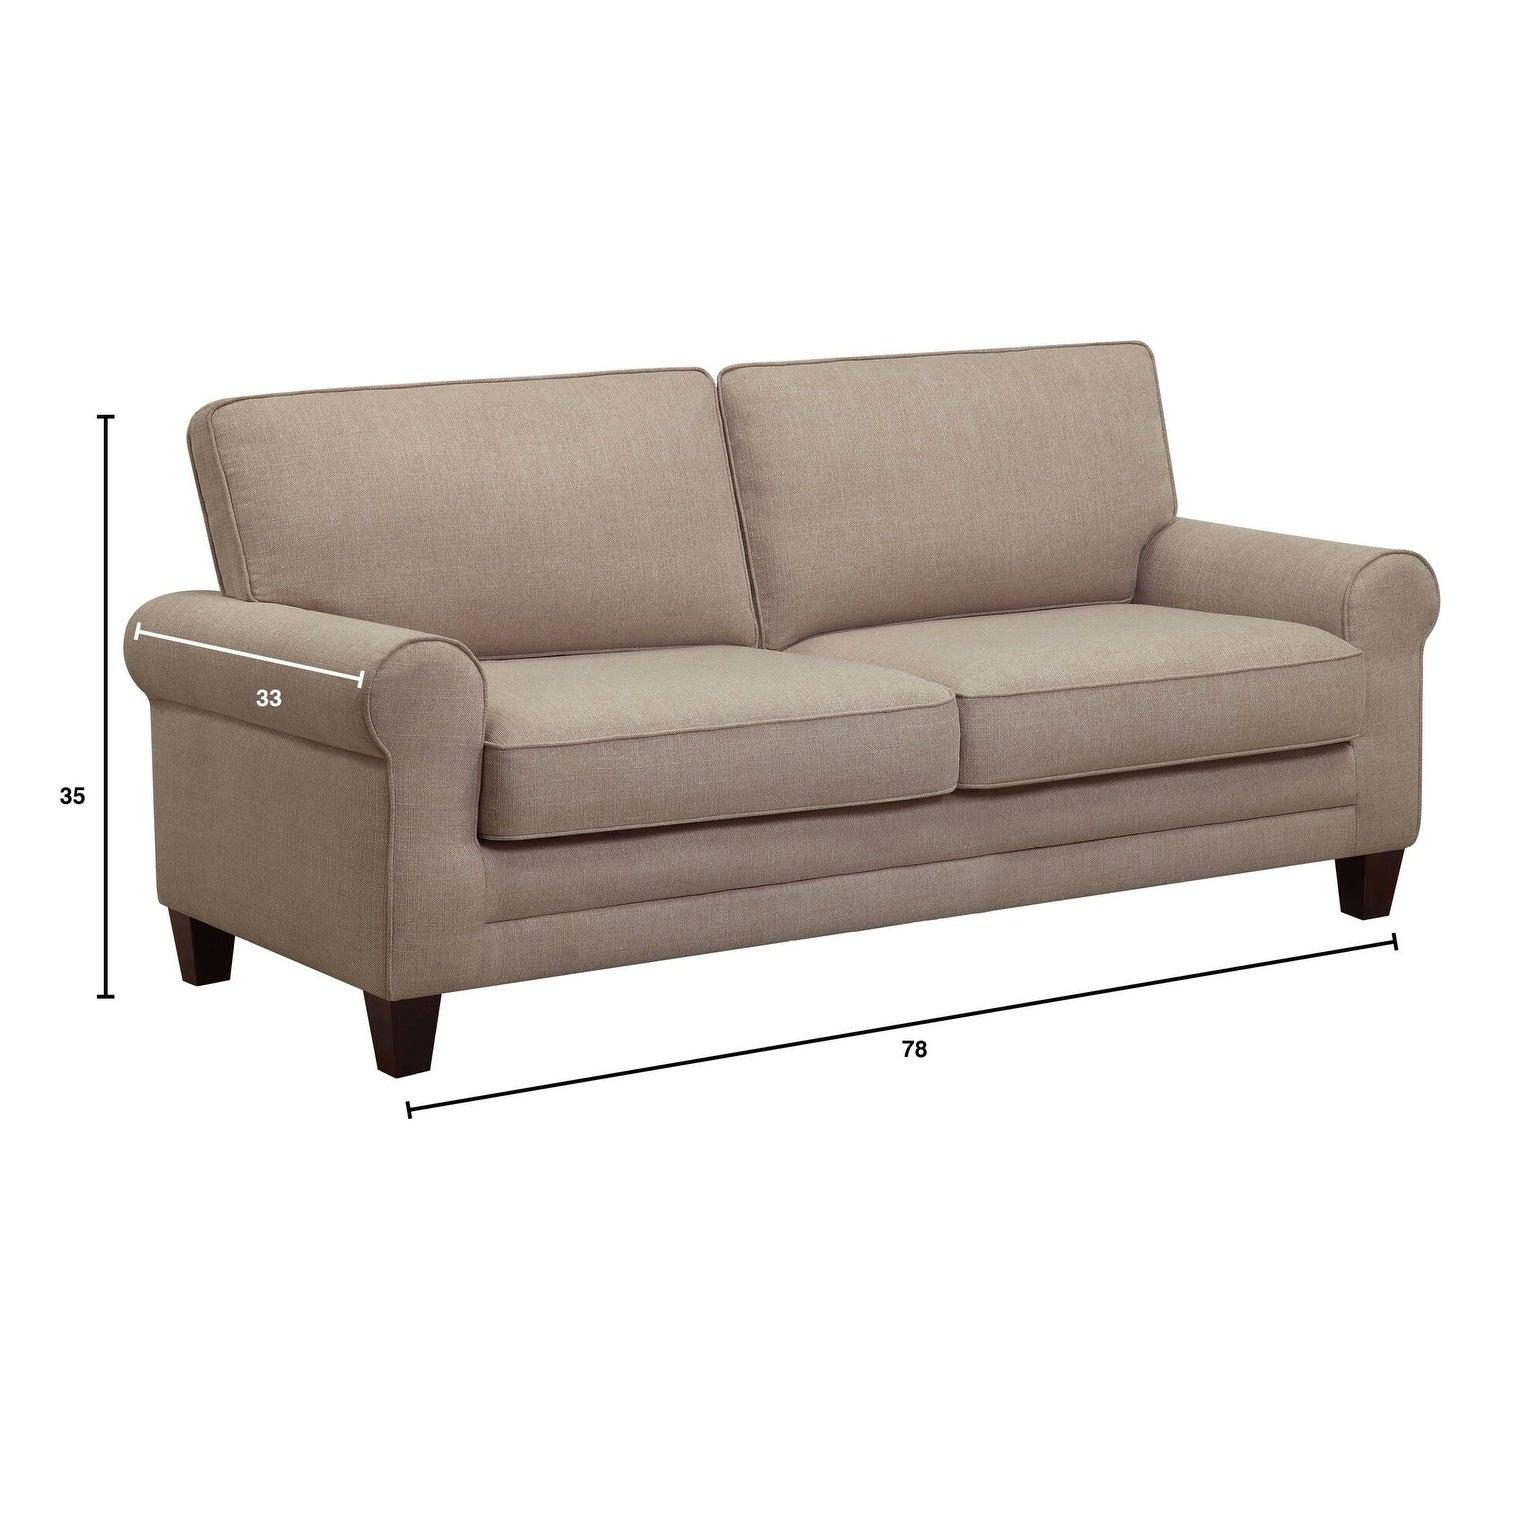 Serta Copenhagen 78 Inch Sofa Free Shipping Today 16767813